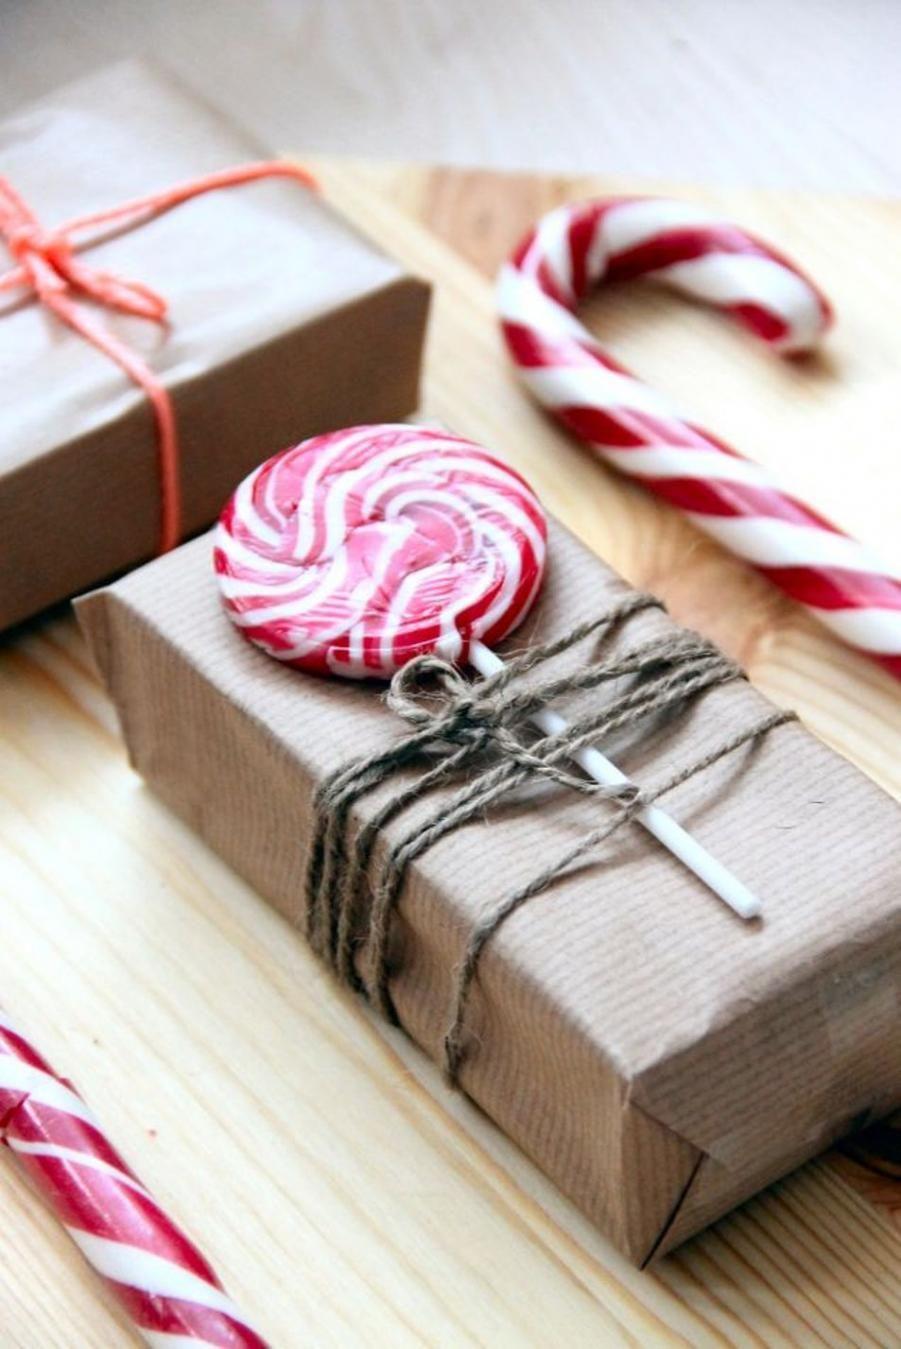 Resultado de imagem para ideas para envolver regalos navideños